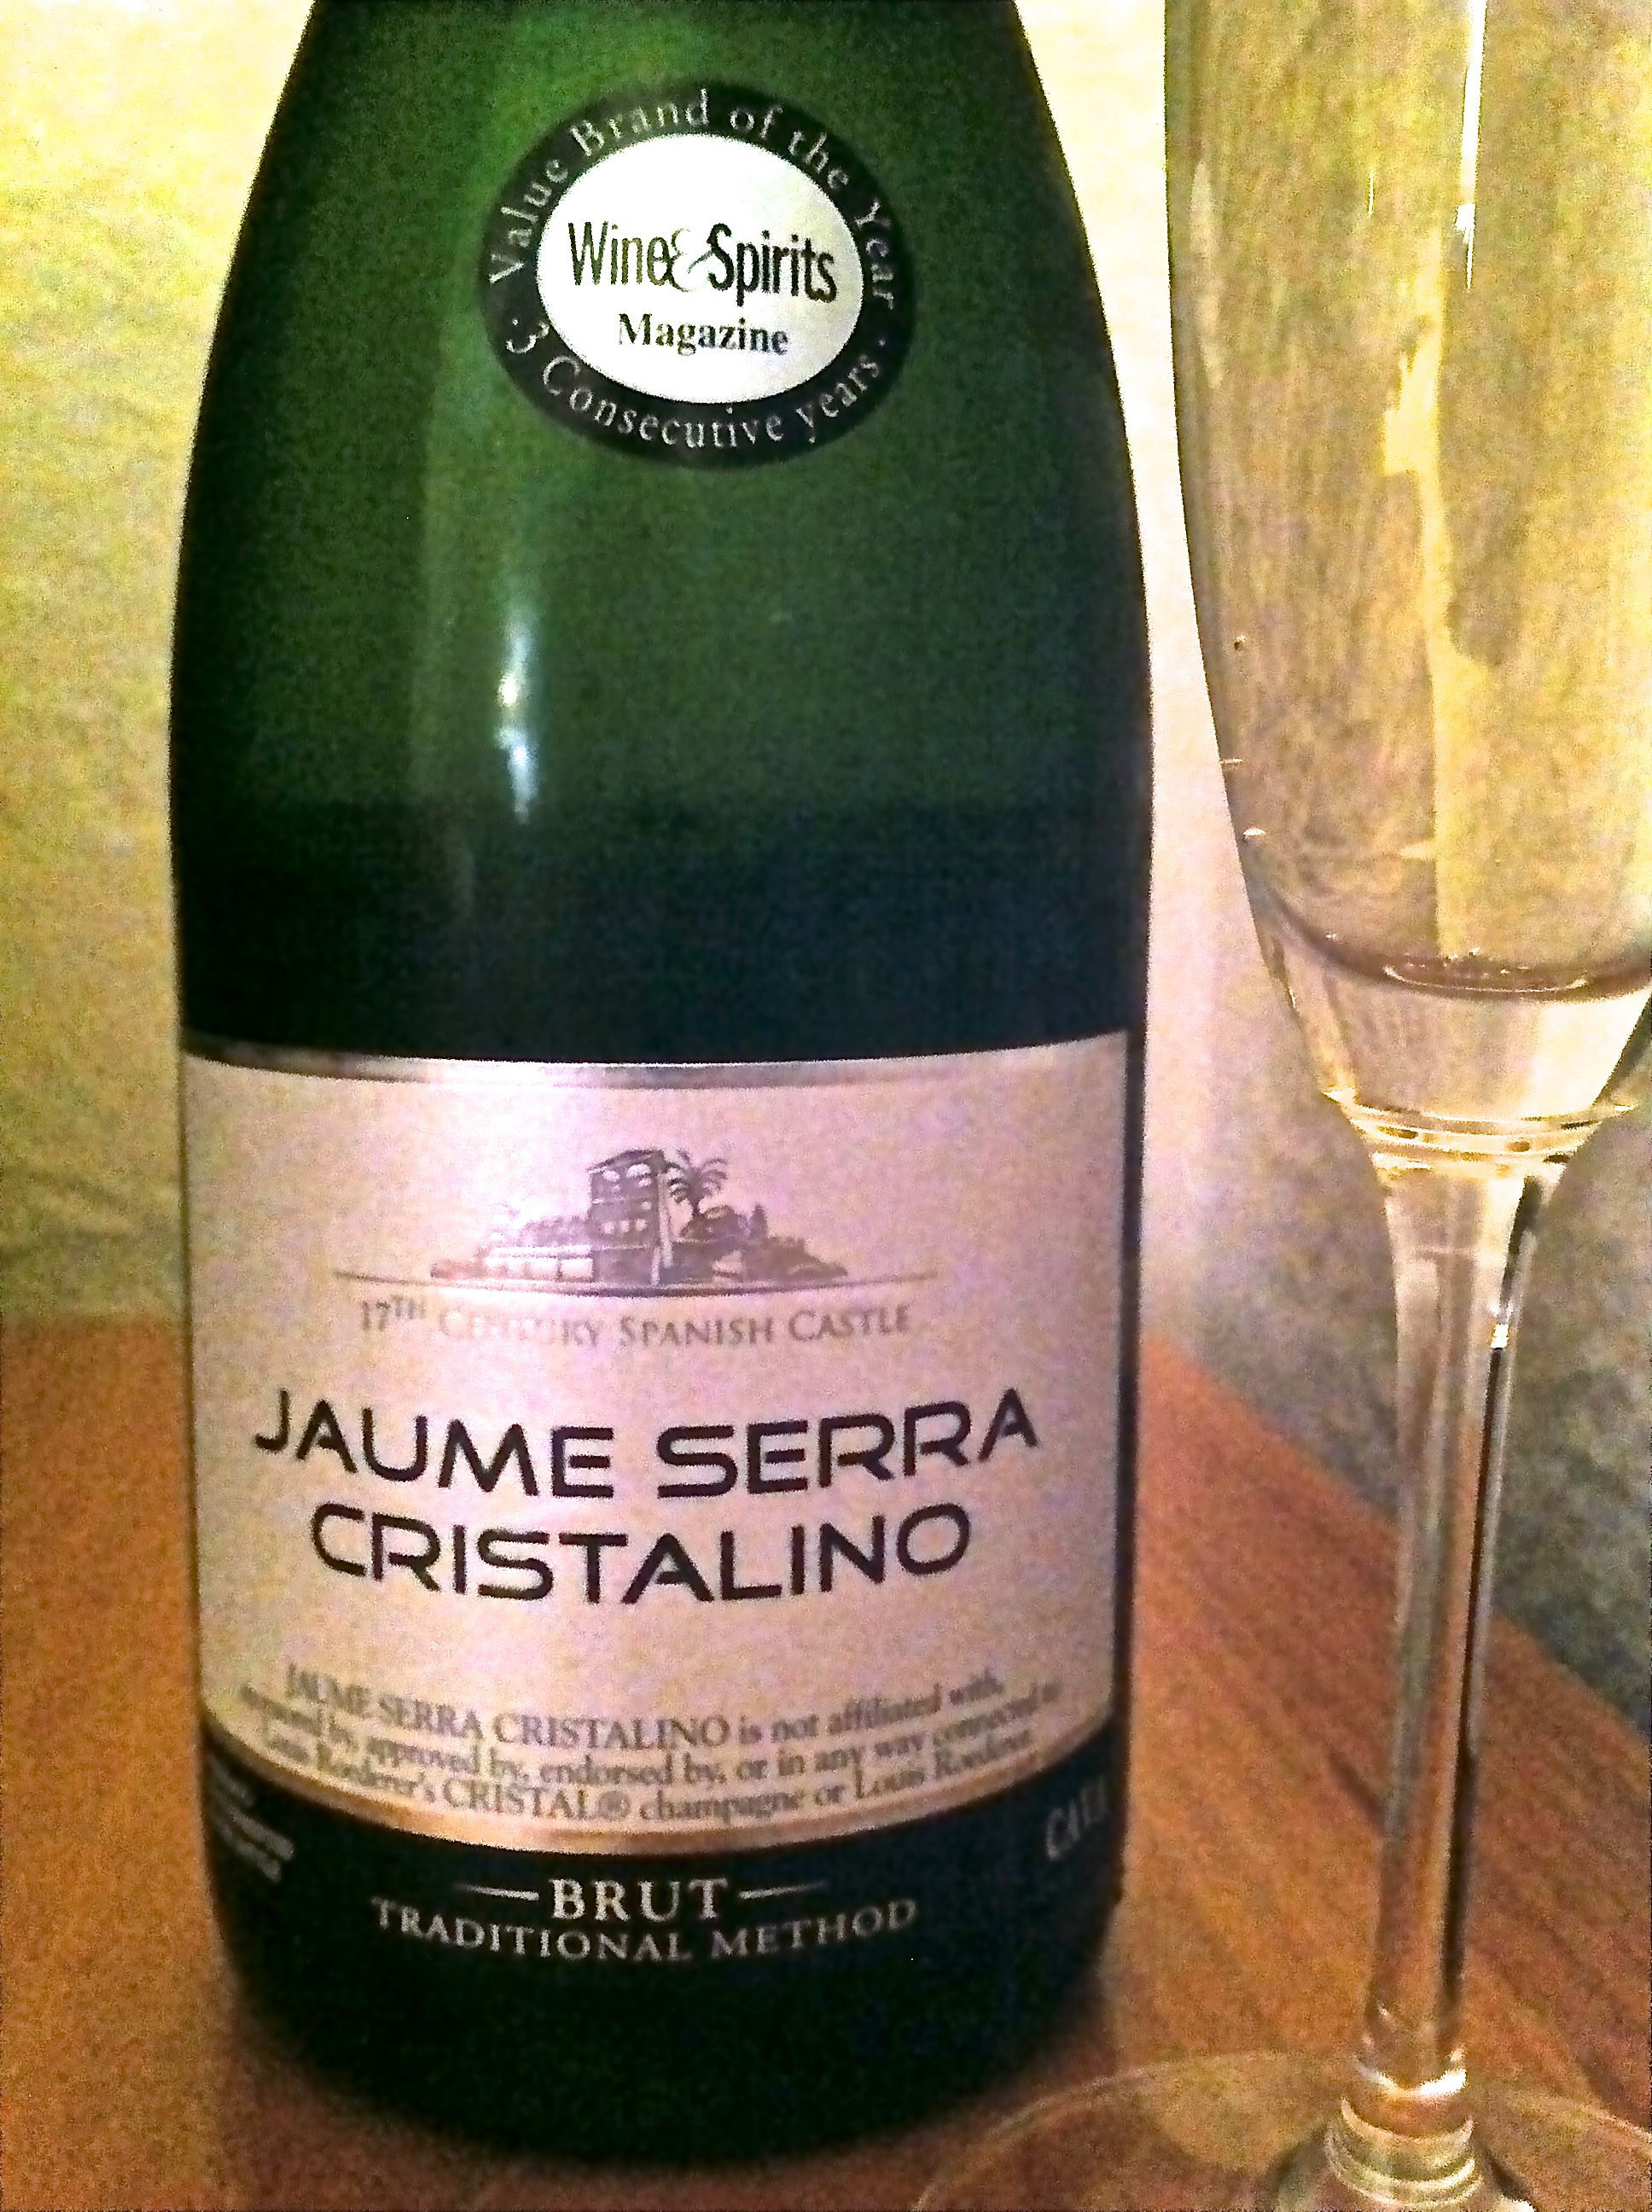 cristalino champagne   NV Jaume Serra Cristalino, Brut Traditional Method Cava, Spain